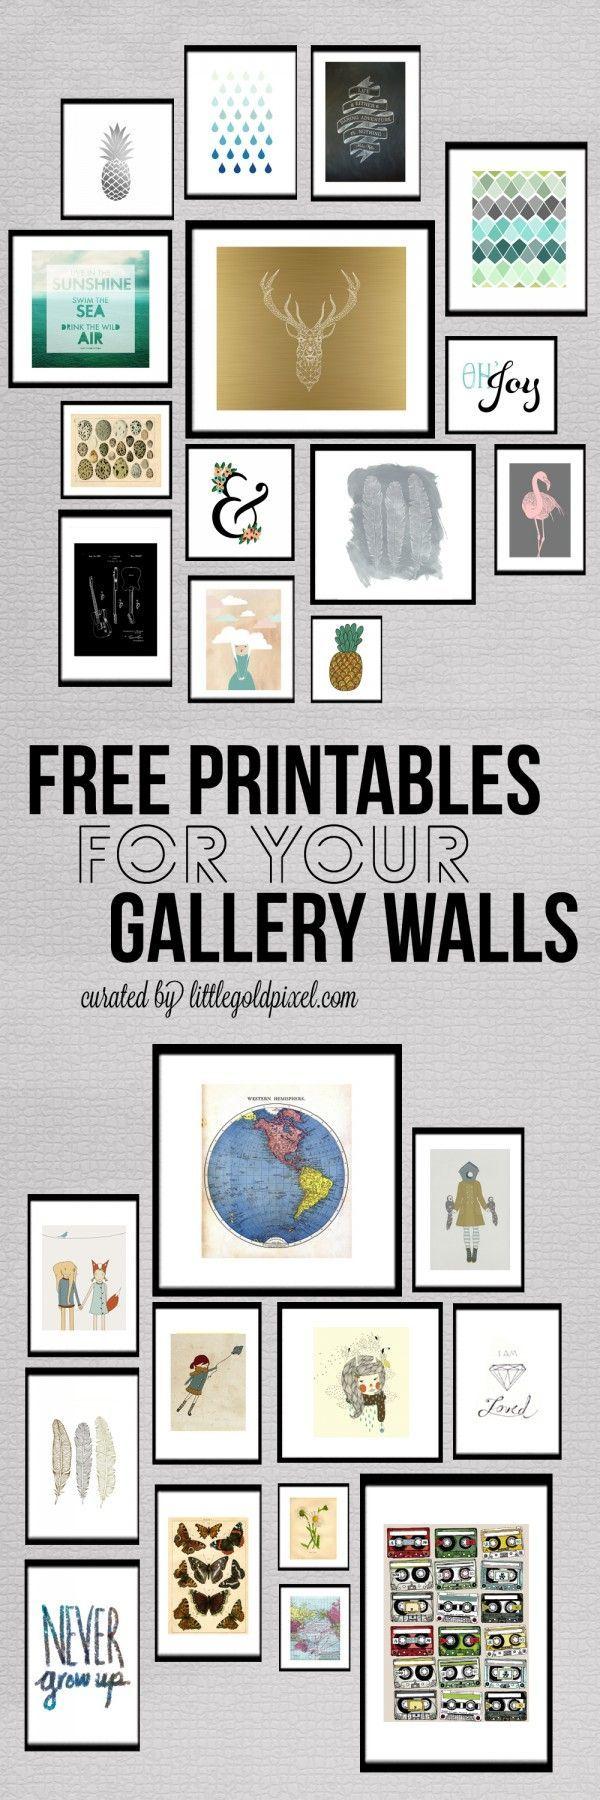 Easy wall art ideas gallery wall diy wall art and free printables